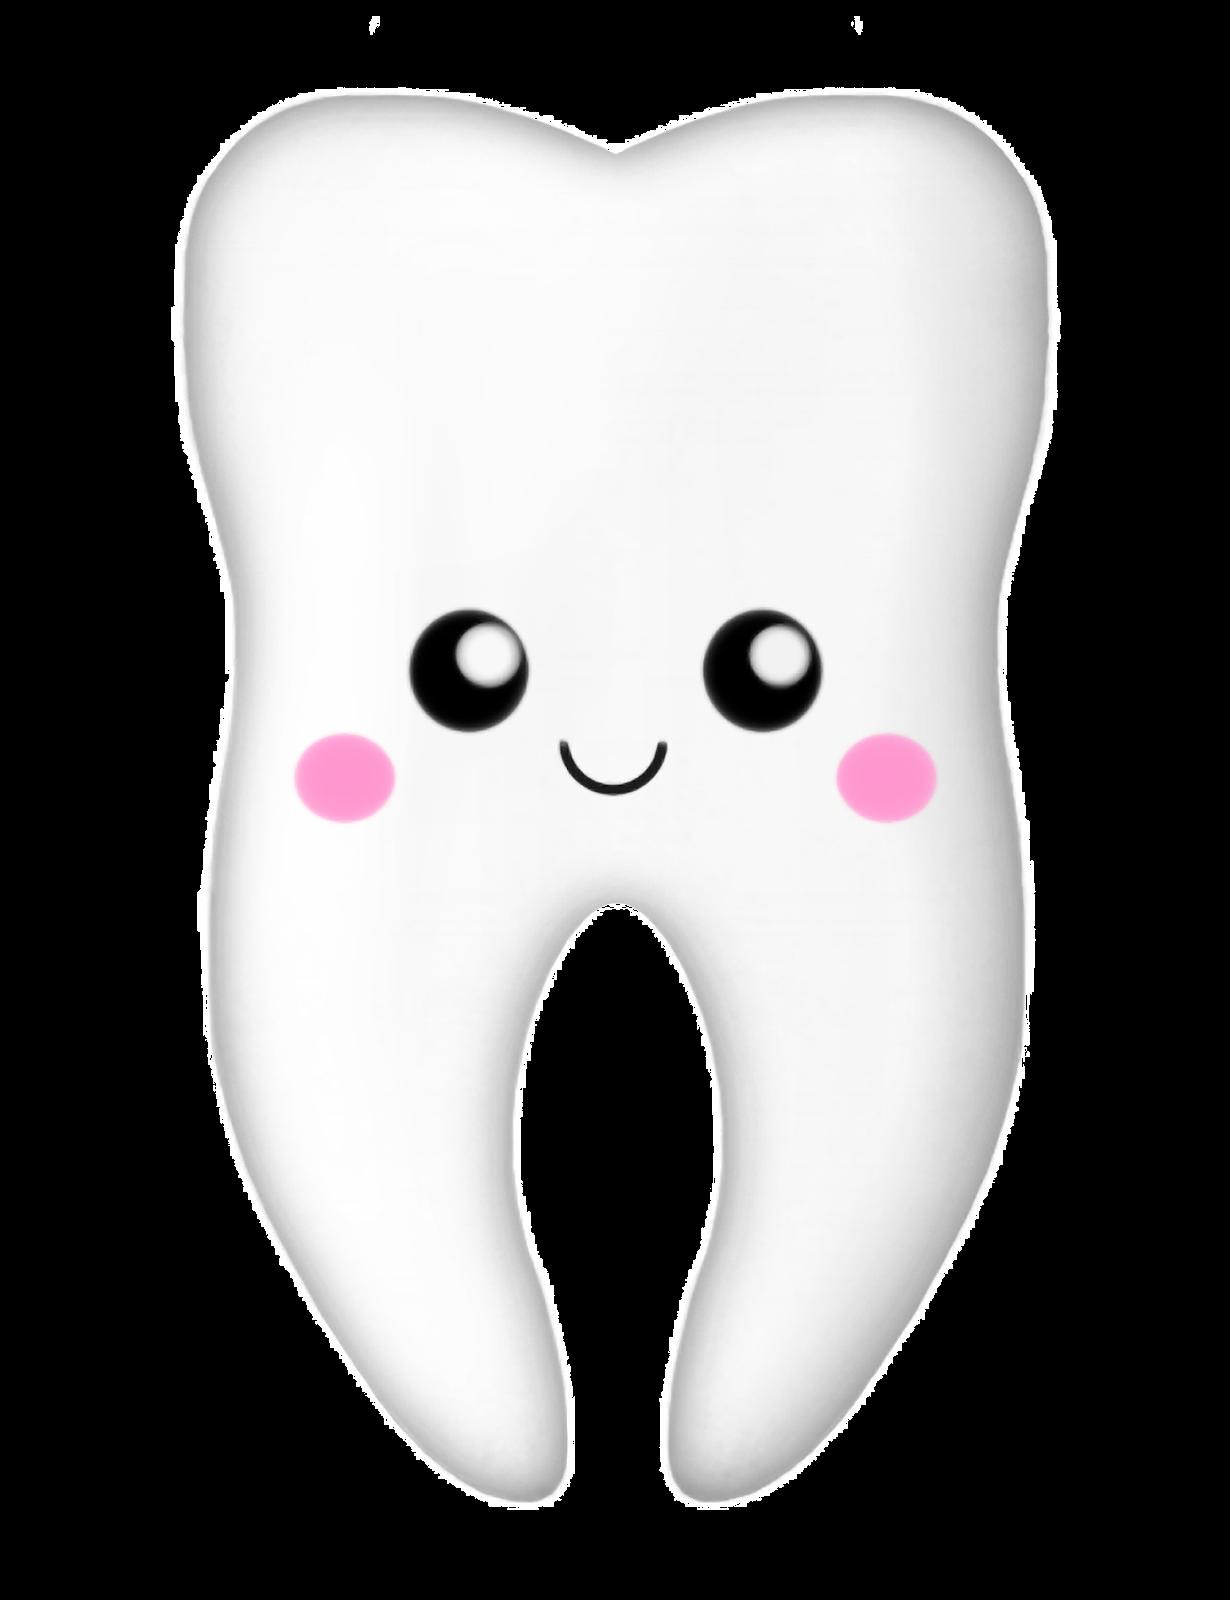 Tooth png recherche google. Pacifier clipart mouth clipart